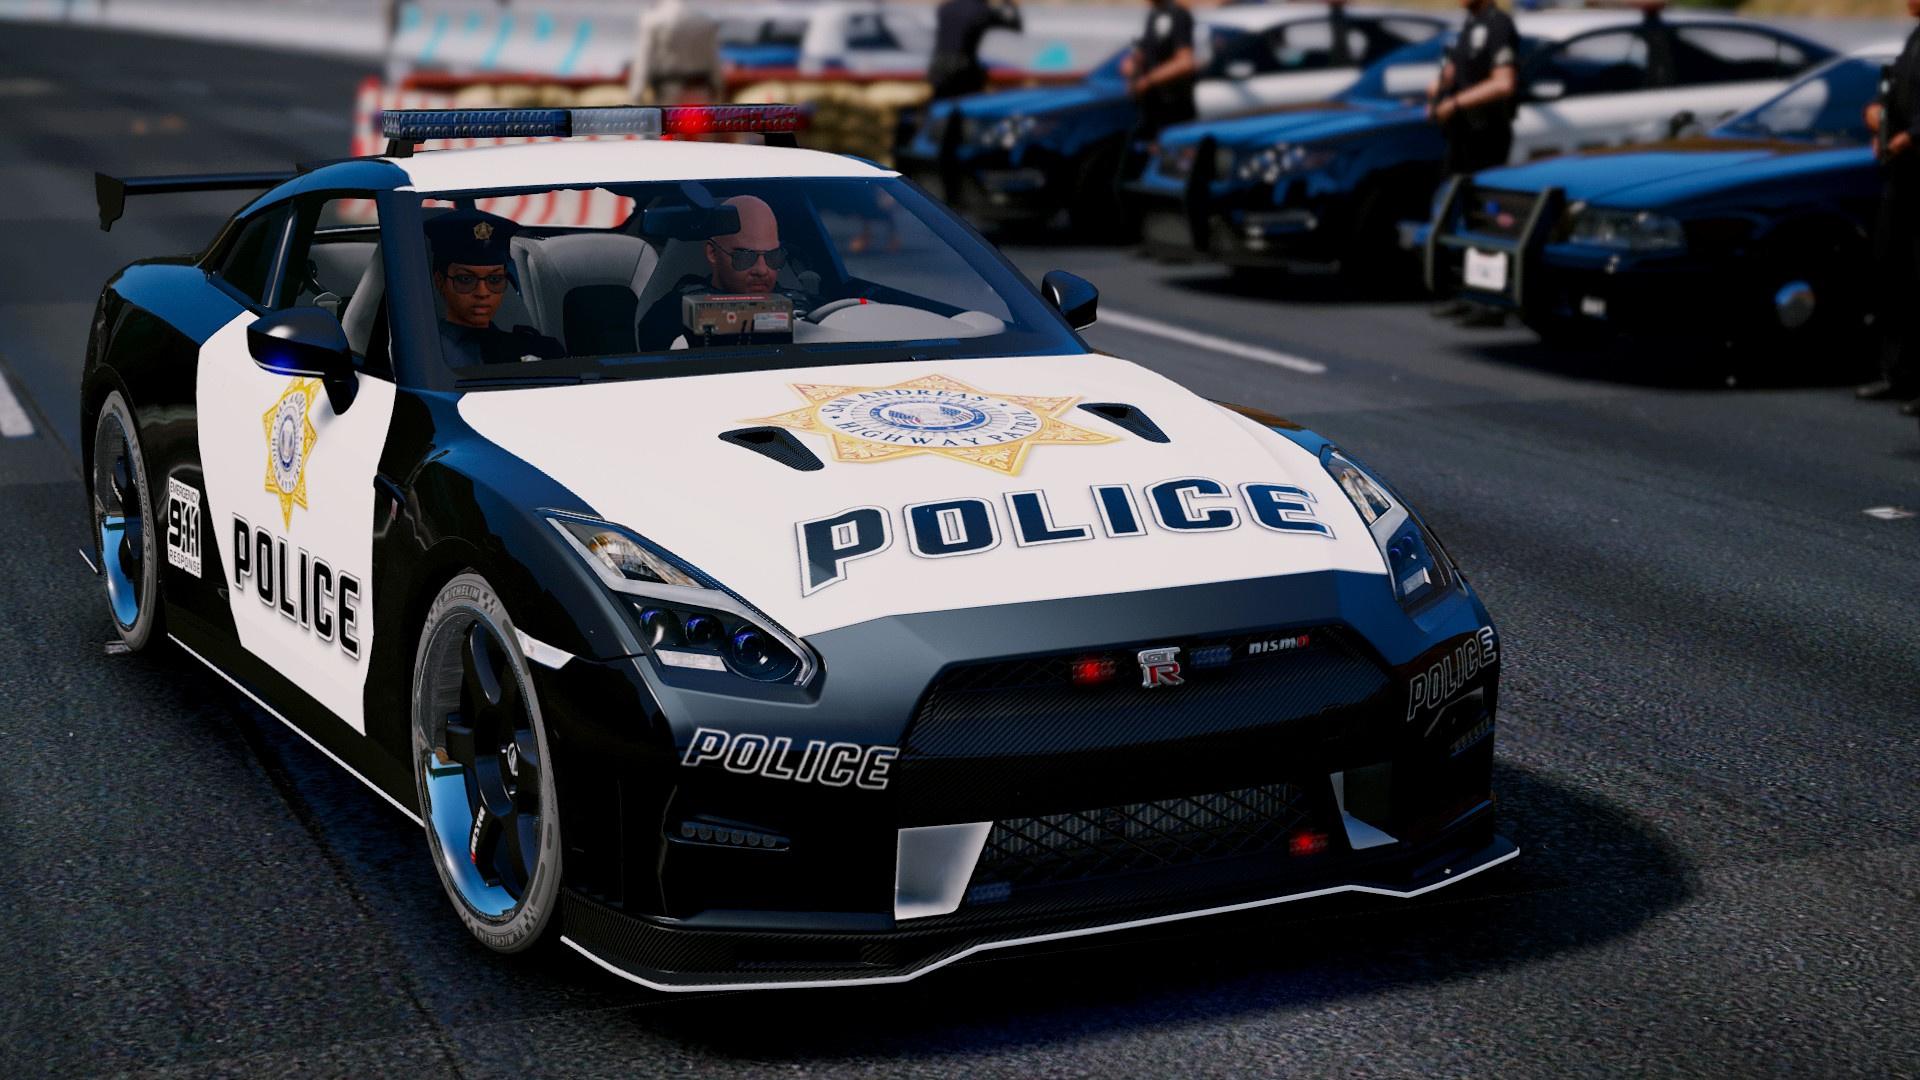 Nissan Gt R Nismo Police Edition Add On Tuning Gta5